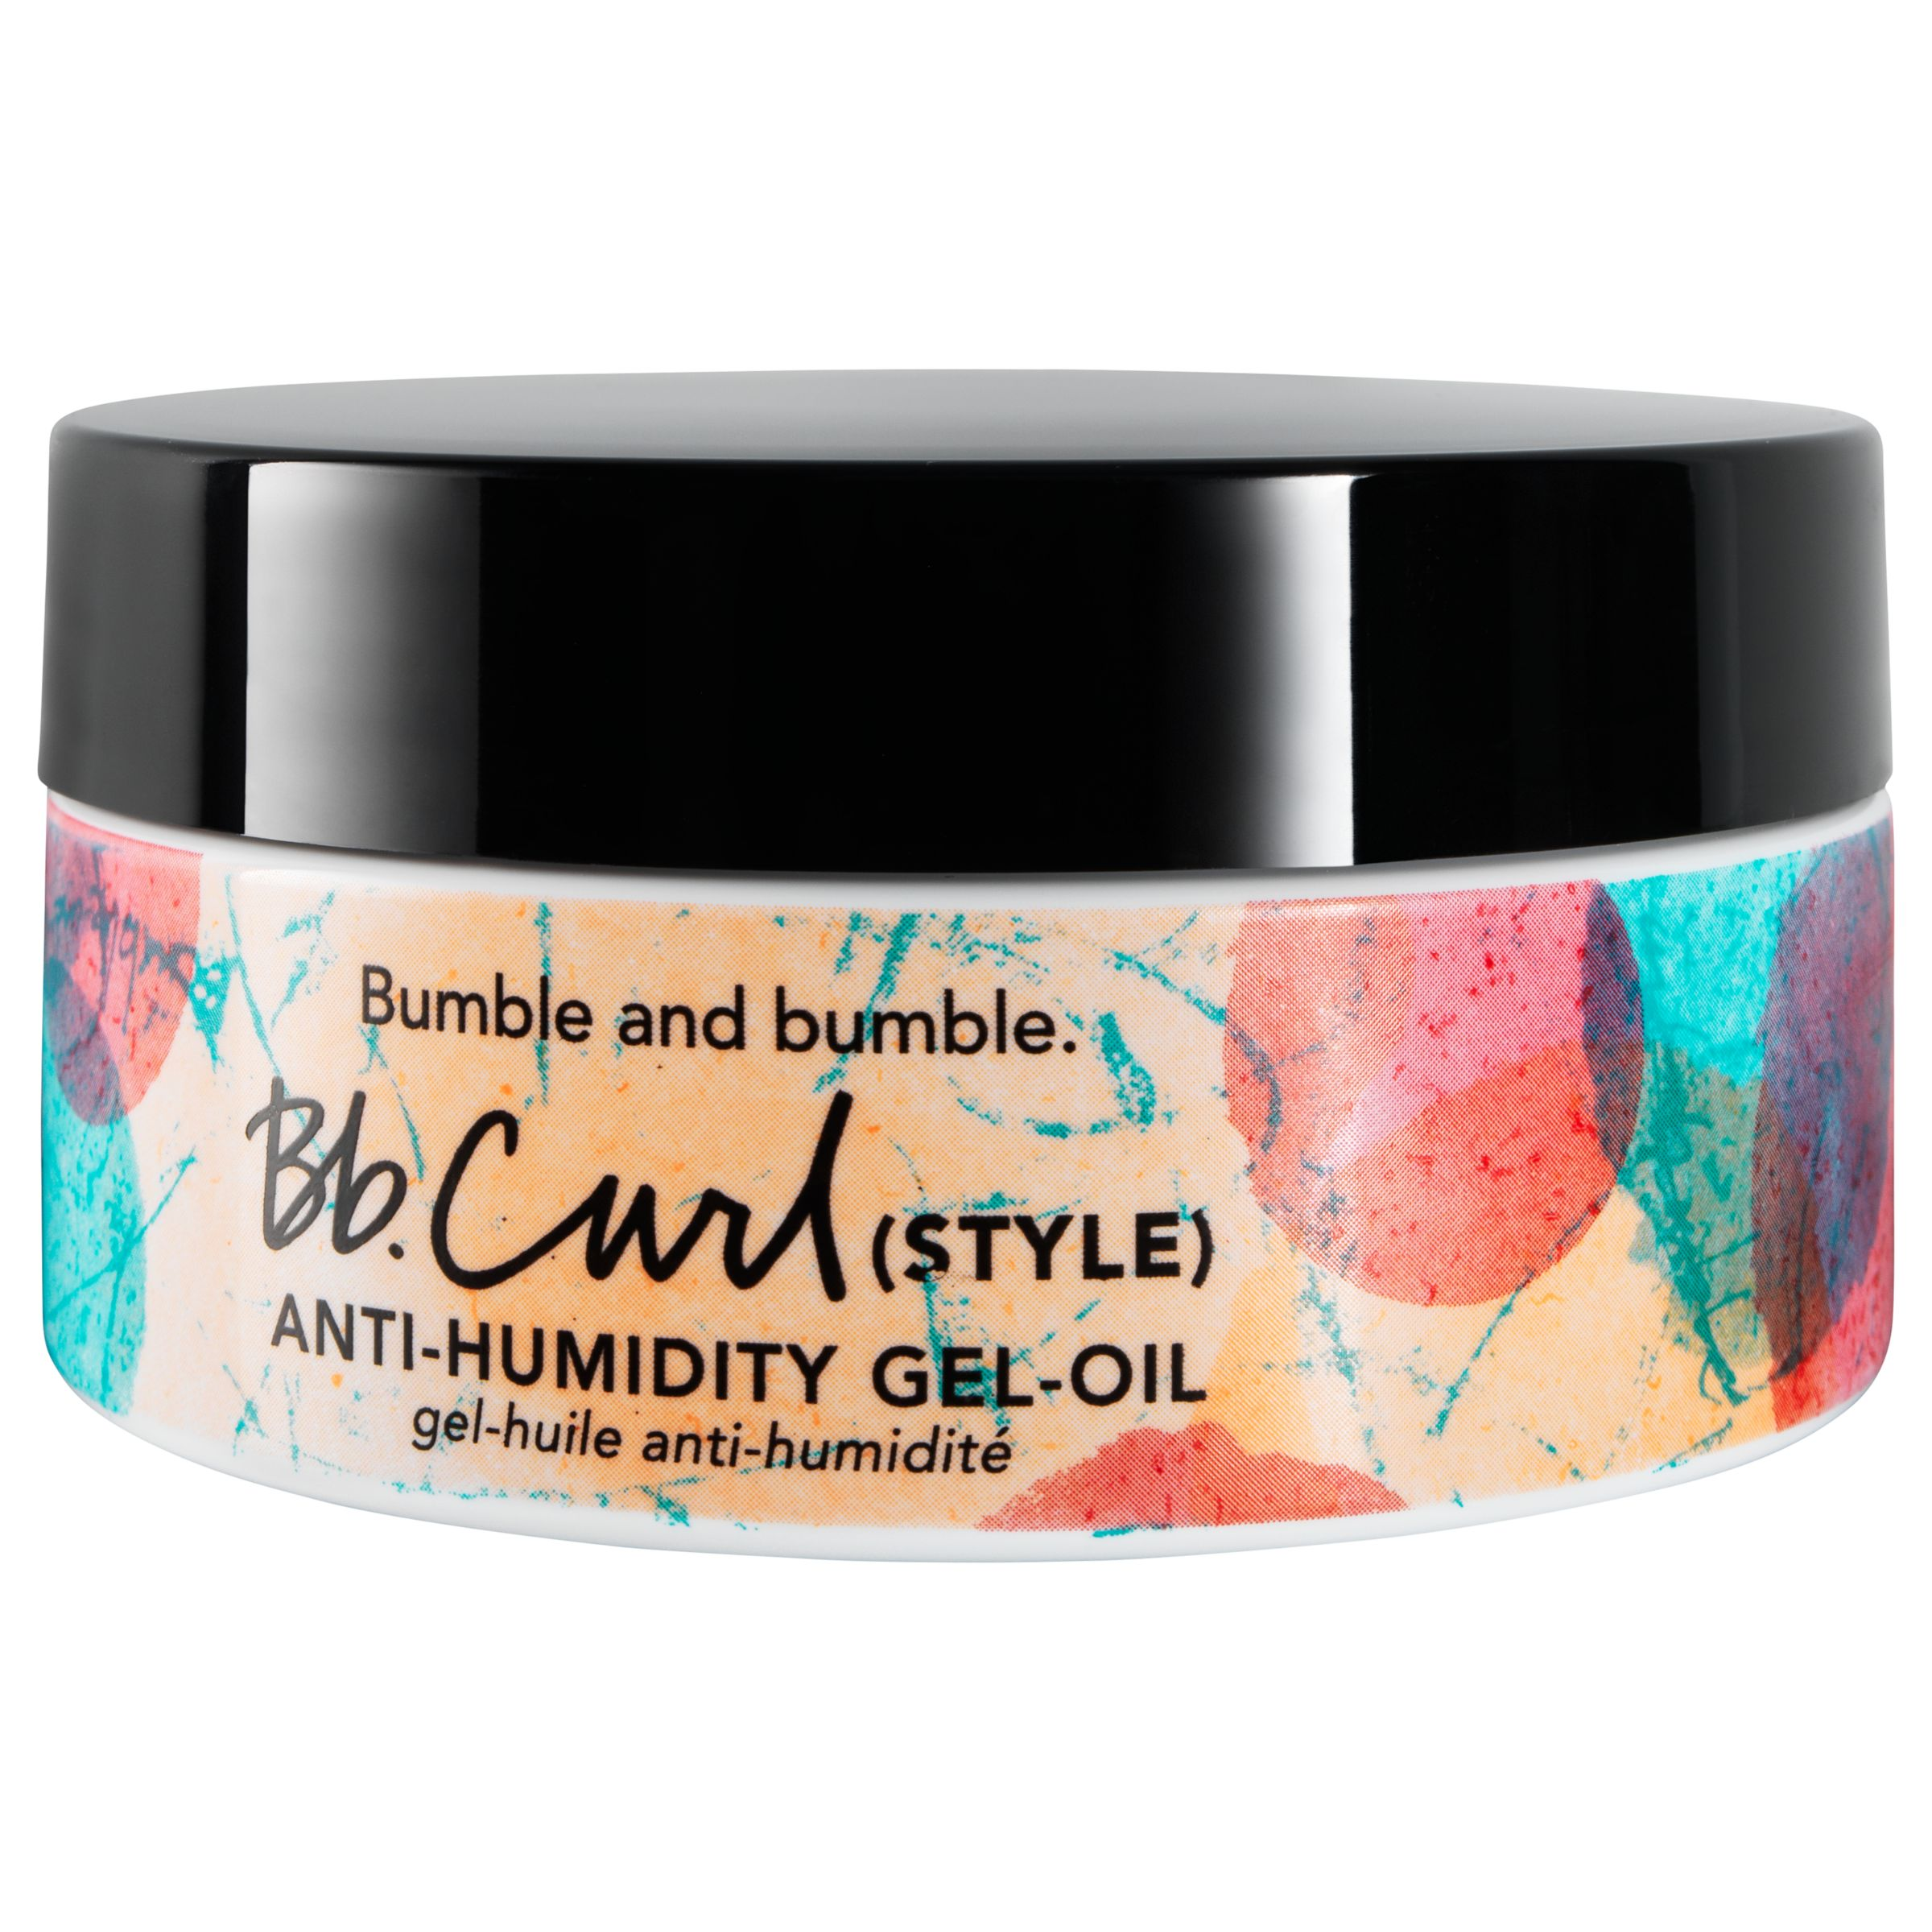 Bumble and bumble Bumble and bumble Curl Anti-Humidity Gel-Oil, 190ml